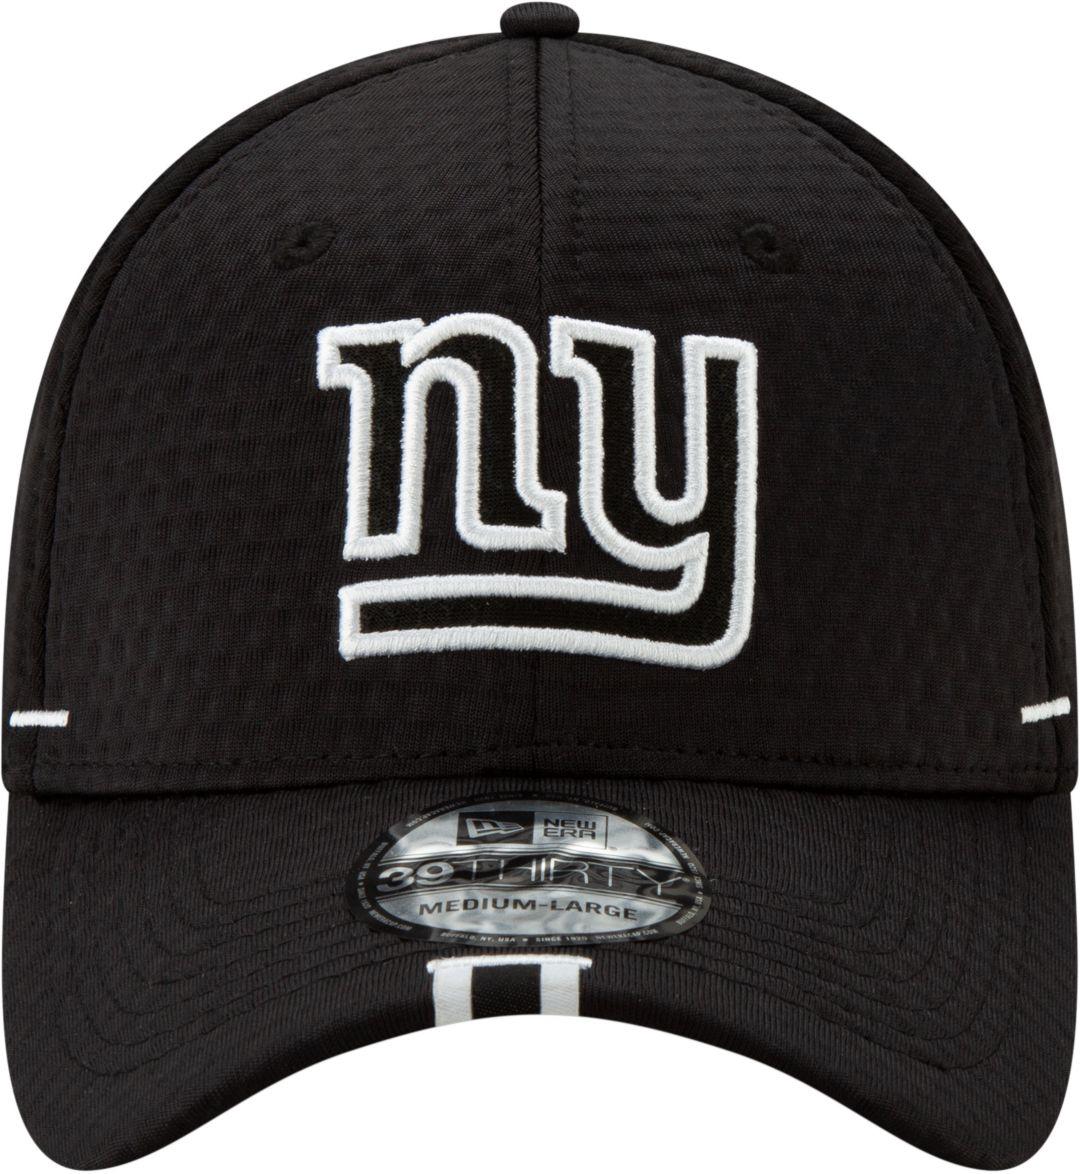 3f02f2f7 New Era Men's New York Giants Sideline Training Camp 39Thirty Stretch Fit  Black Hat